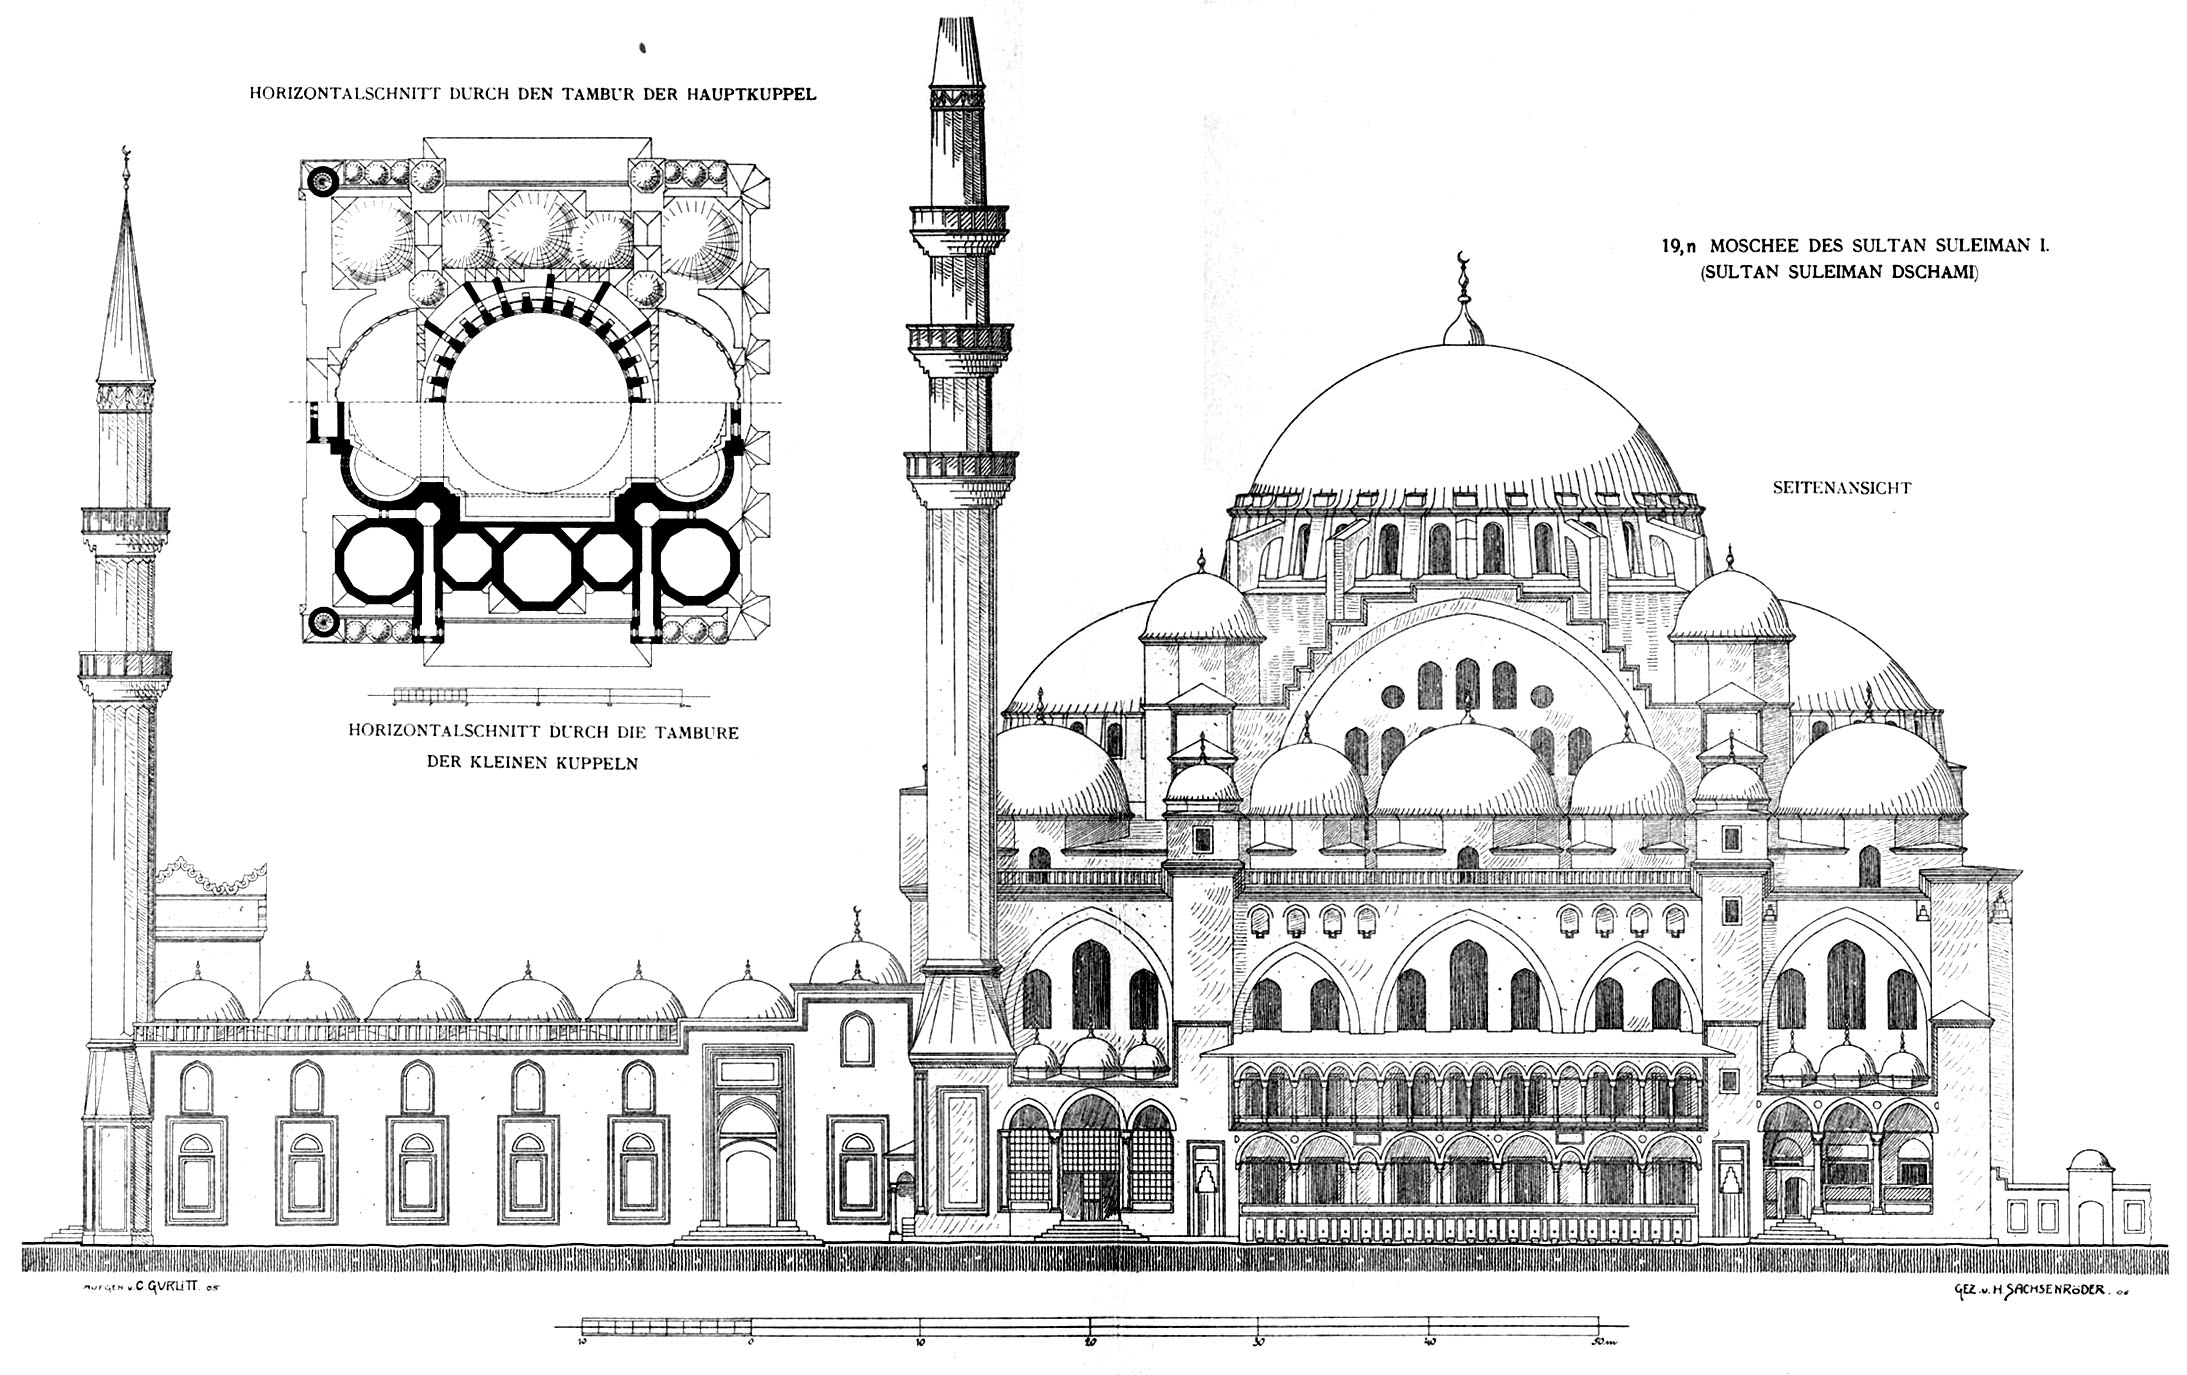 Reflexiones Sobre Un Clasicismo Contemporaneo Tipologias En La Arquitectura Islamica I Mezquitas